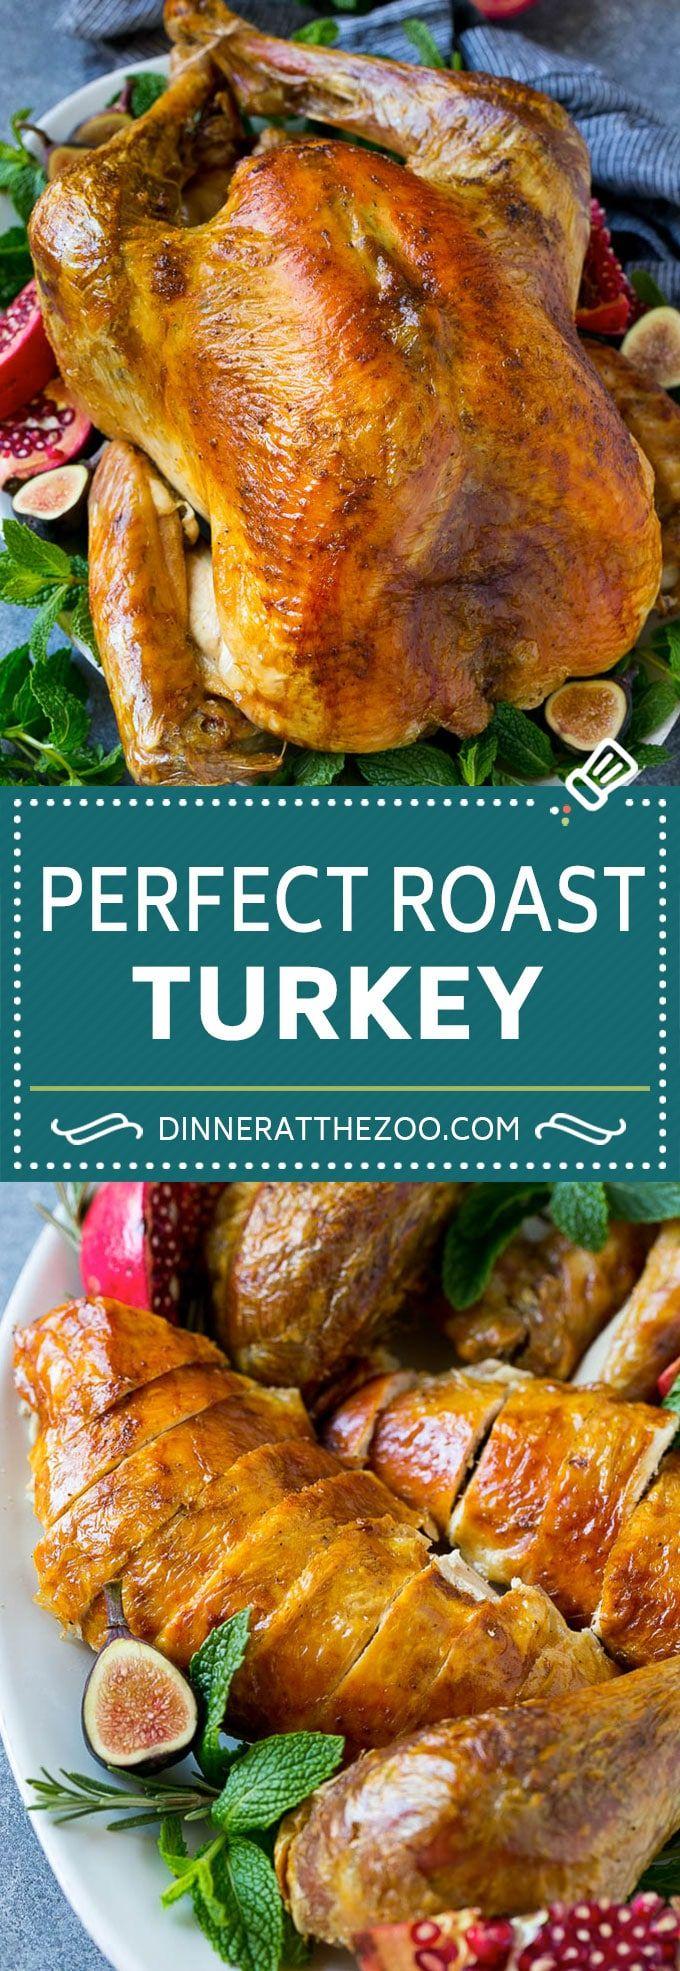 Photo of Roast Turkey for Thanksgiving